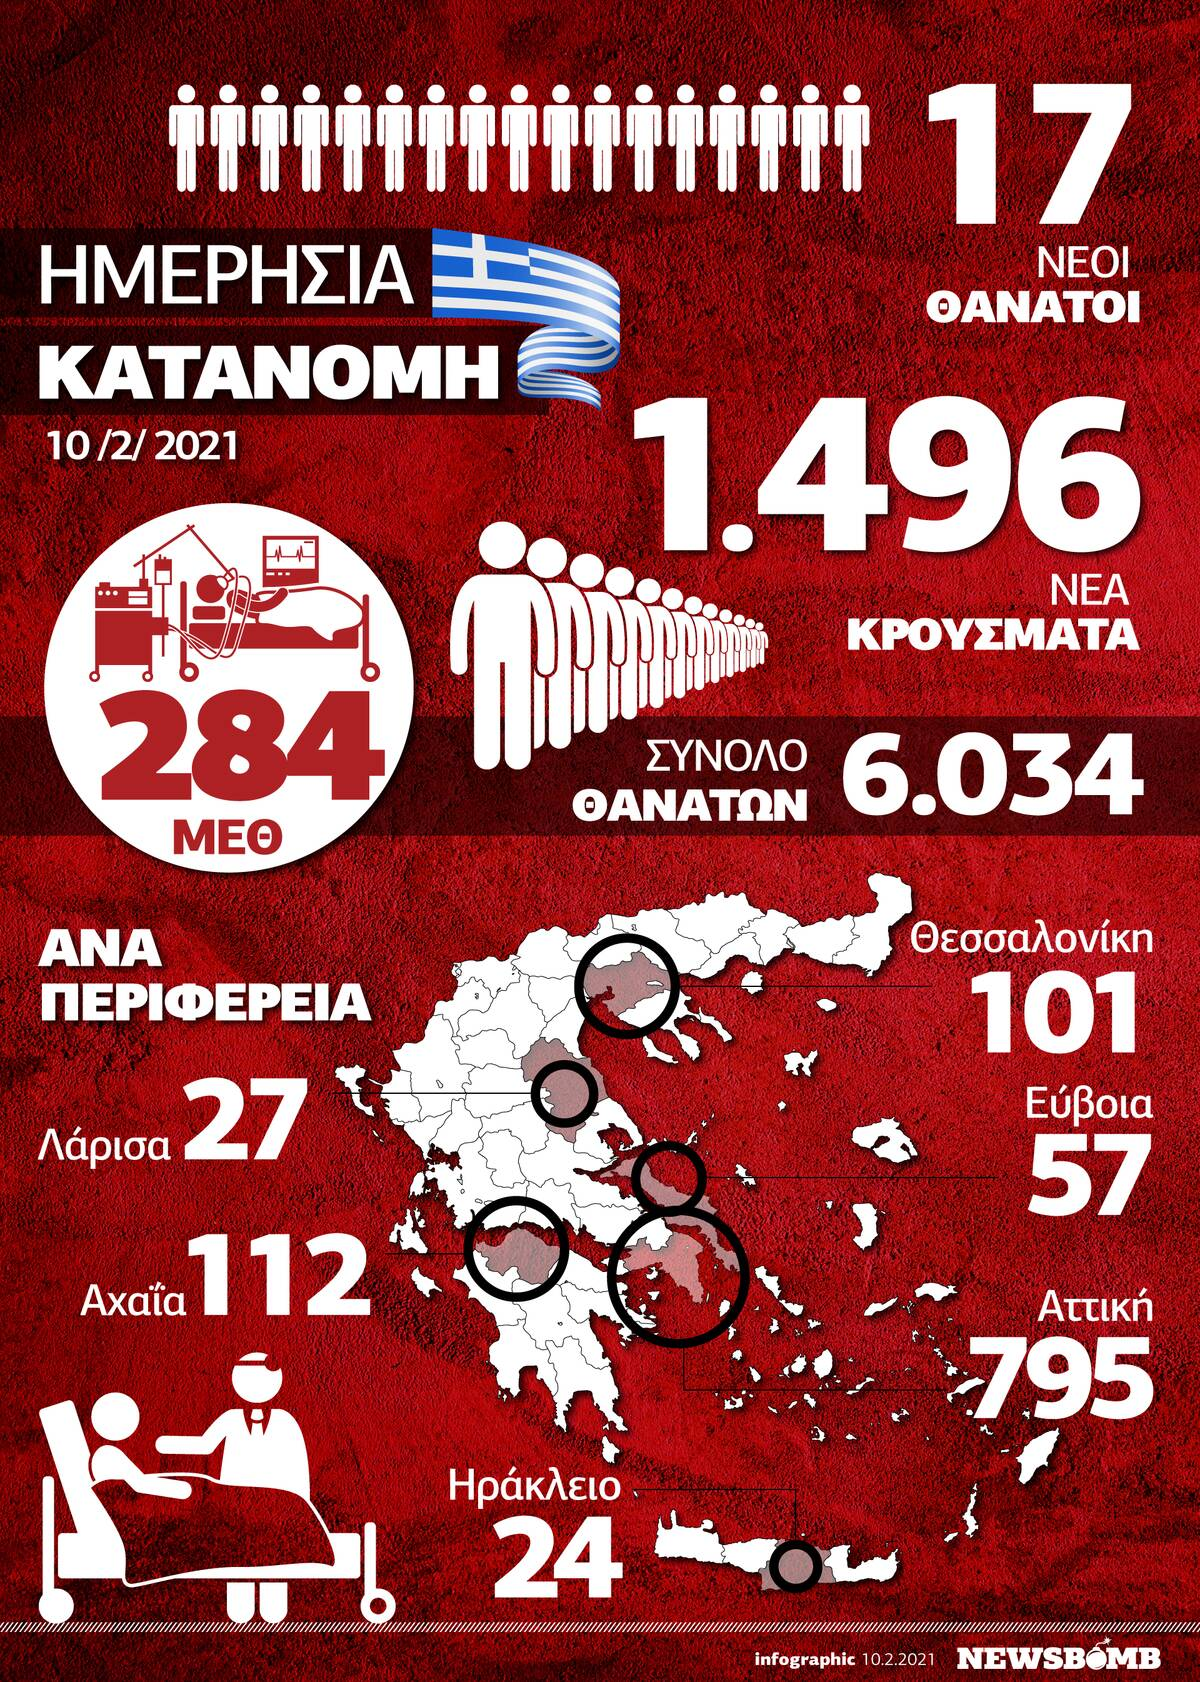 krousmata-simera-10-Febrouariou-Katanomi-Infographic.jpg